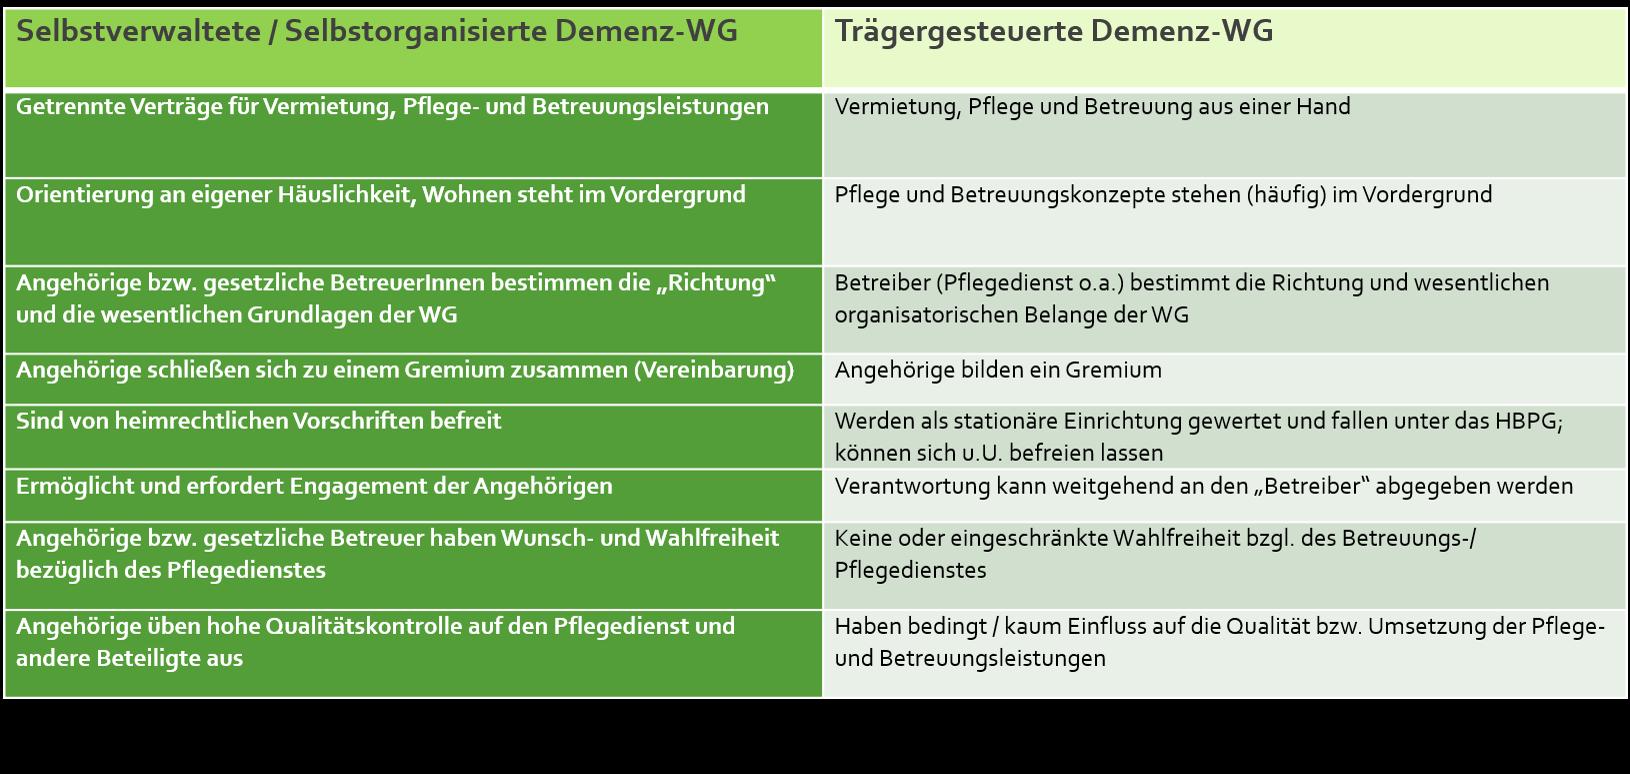 Grafik-selbstverwaltet-vs.-trägersgesteuert_mitQuelle